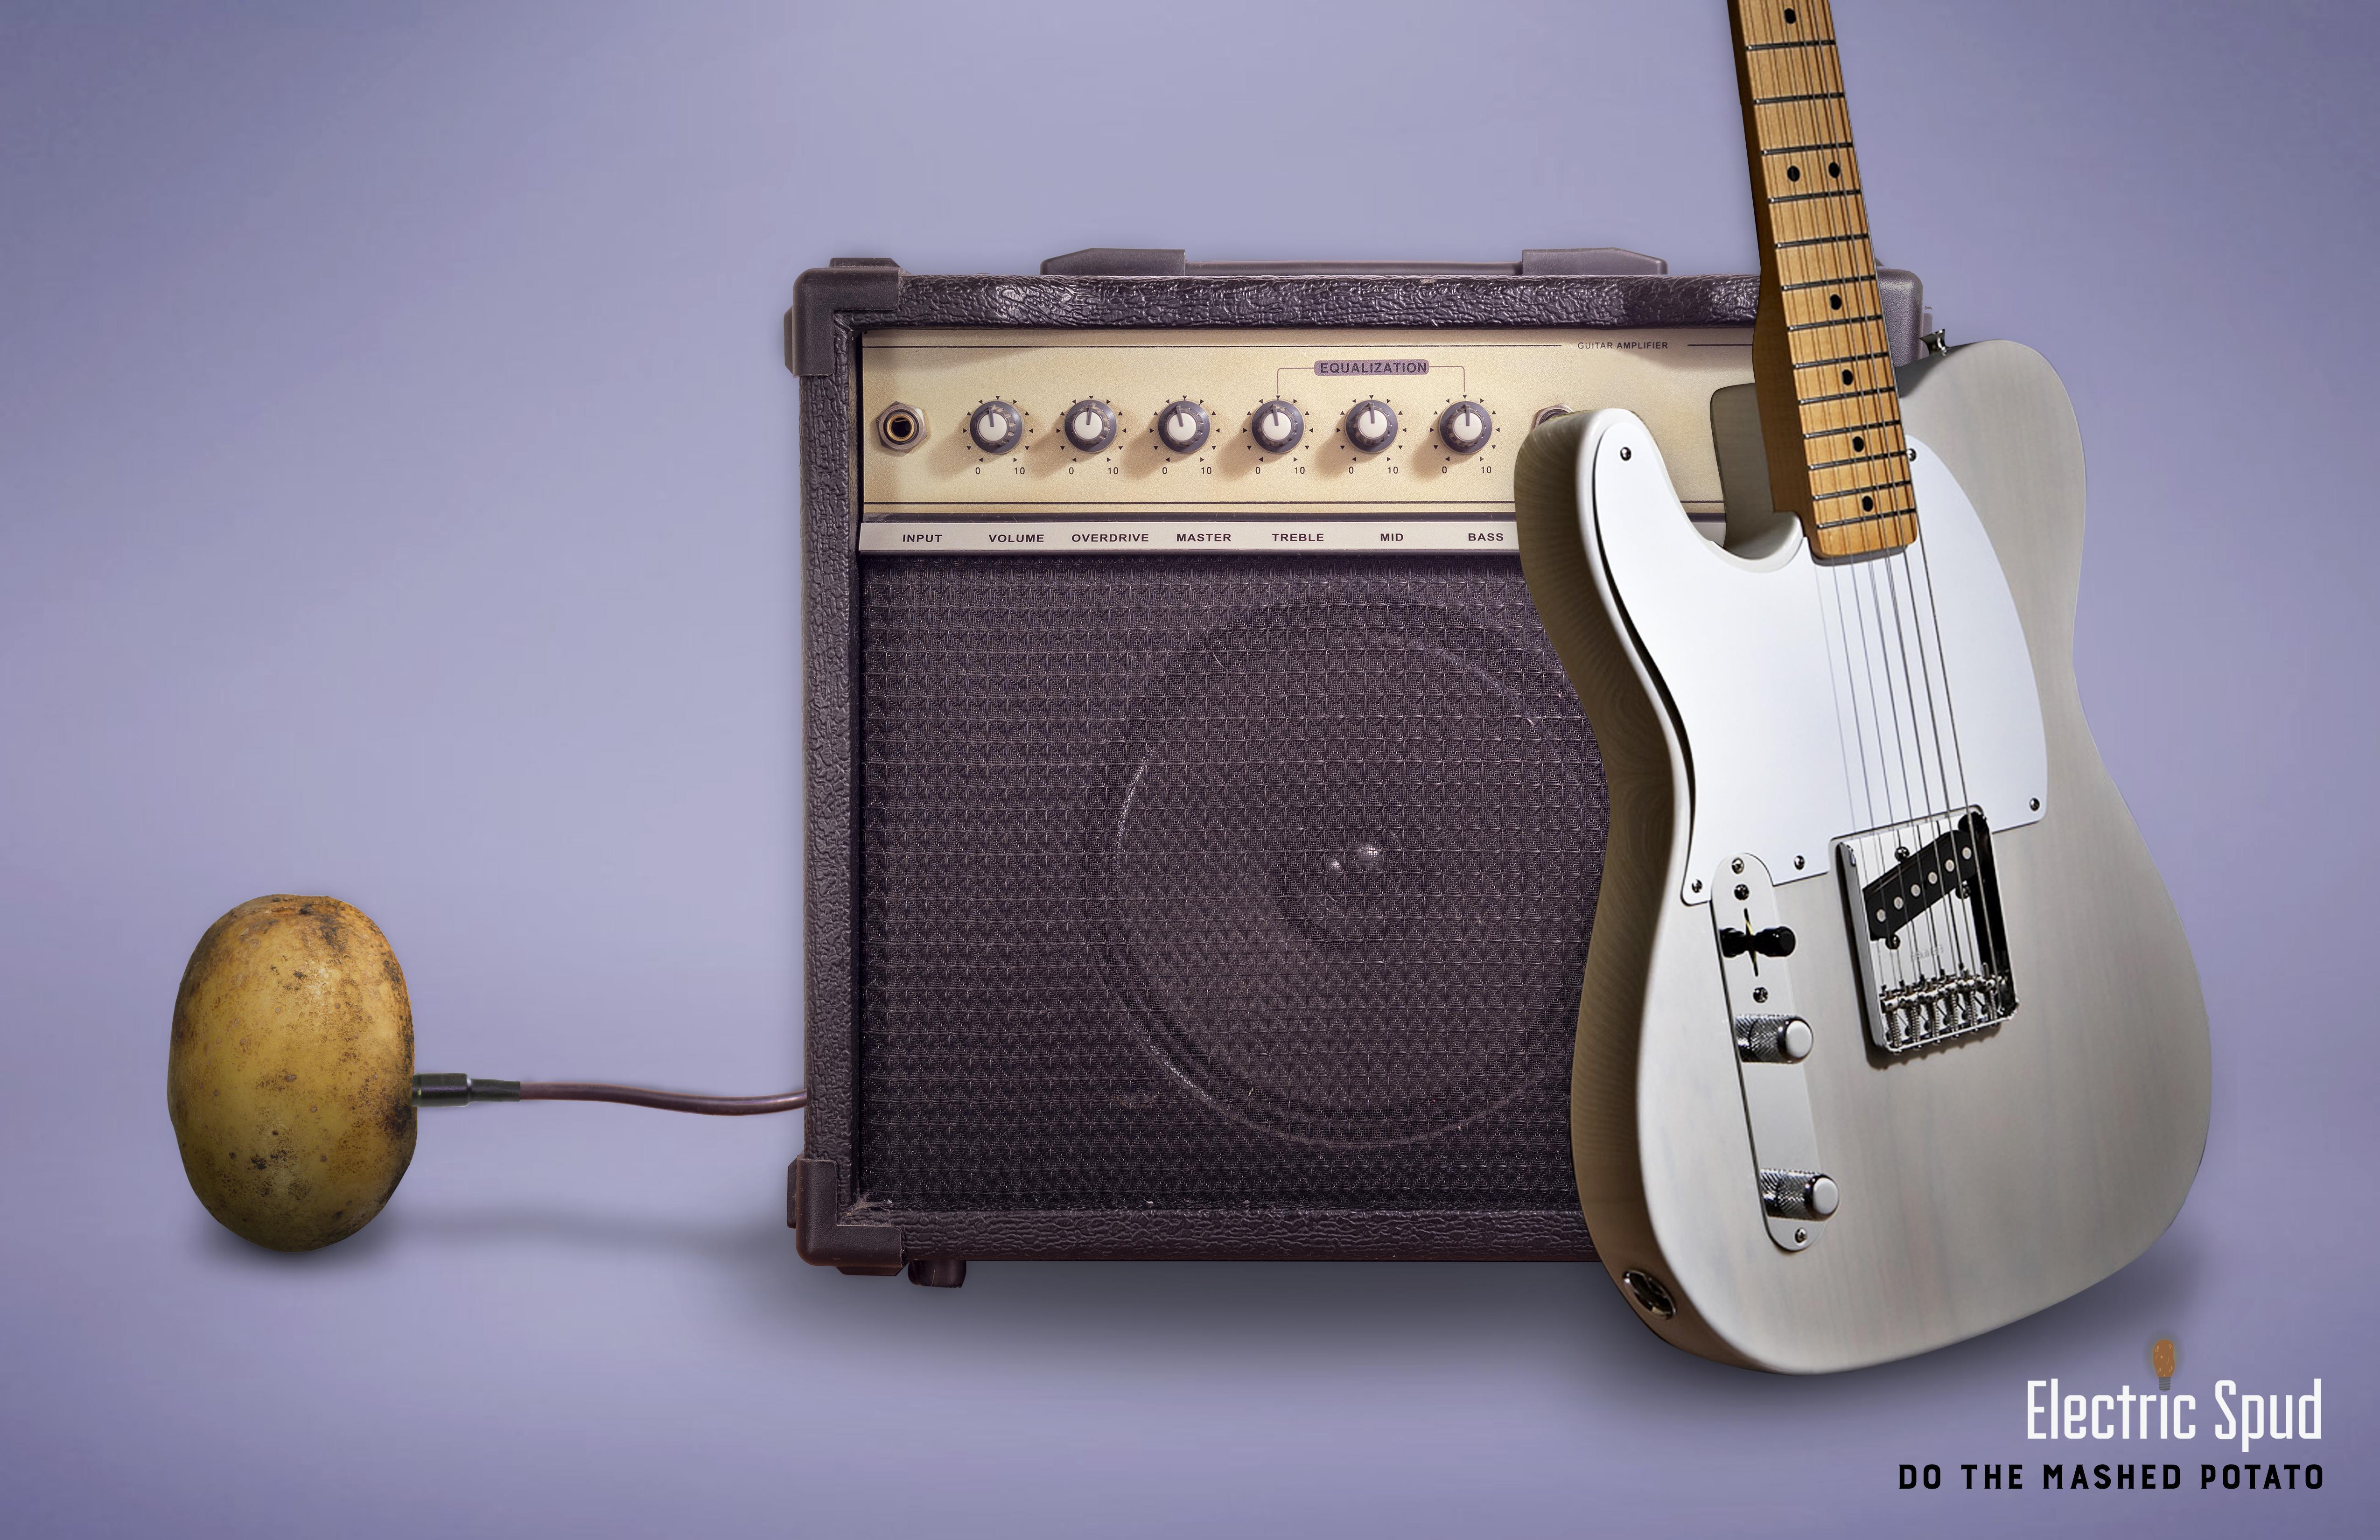 Electric Spud Print Ad - Rock & Roll